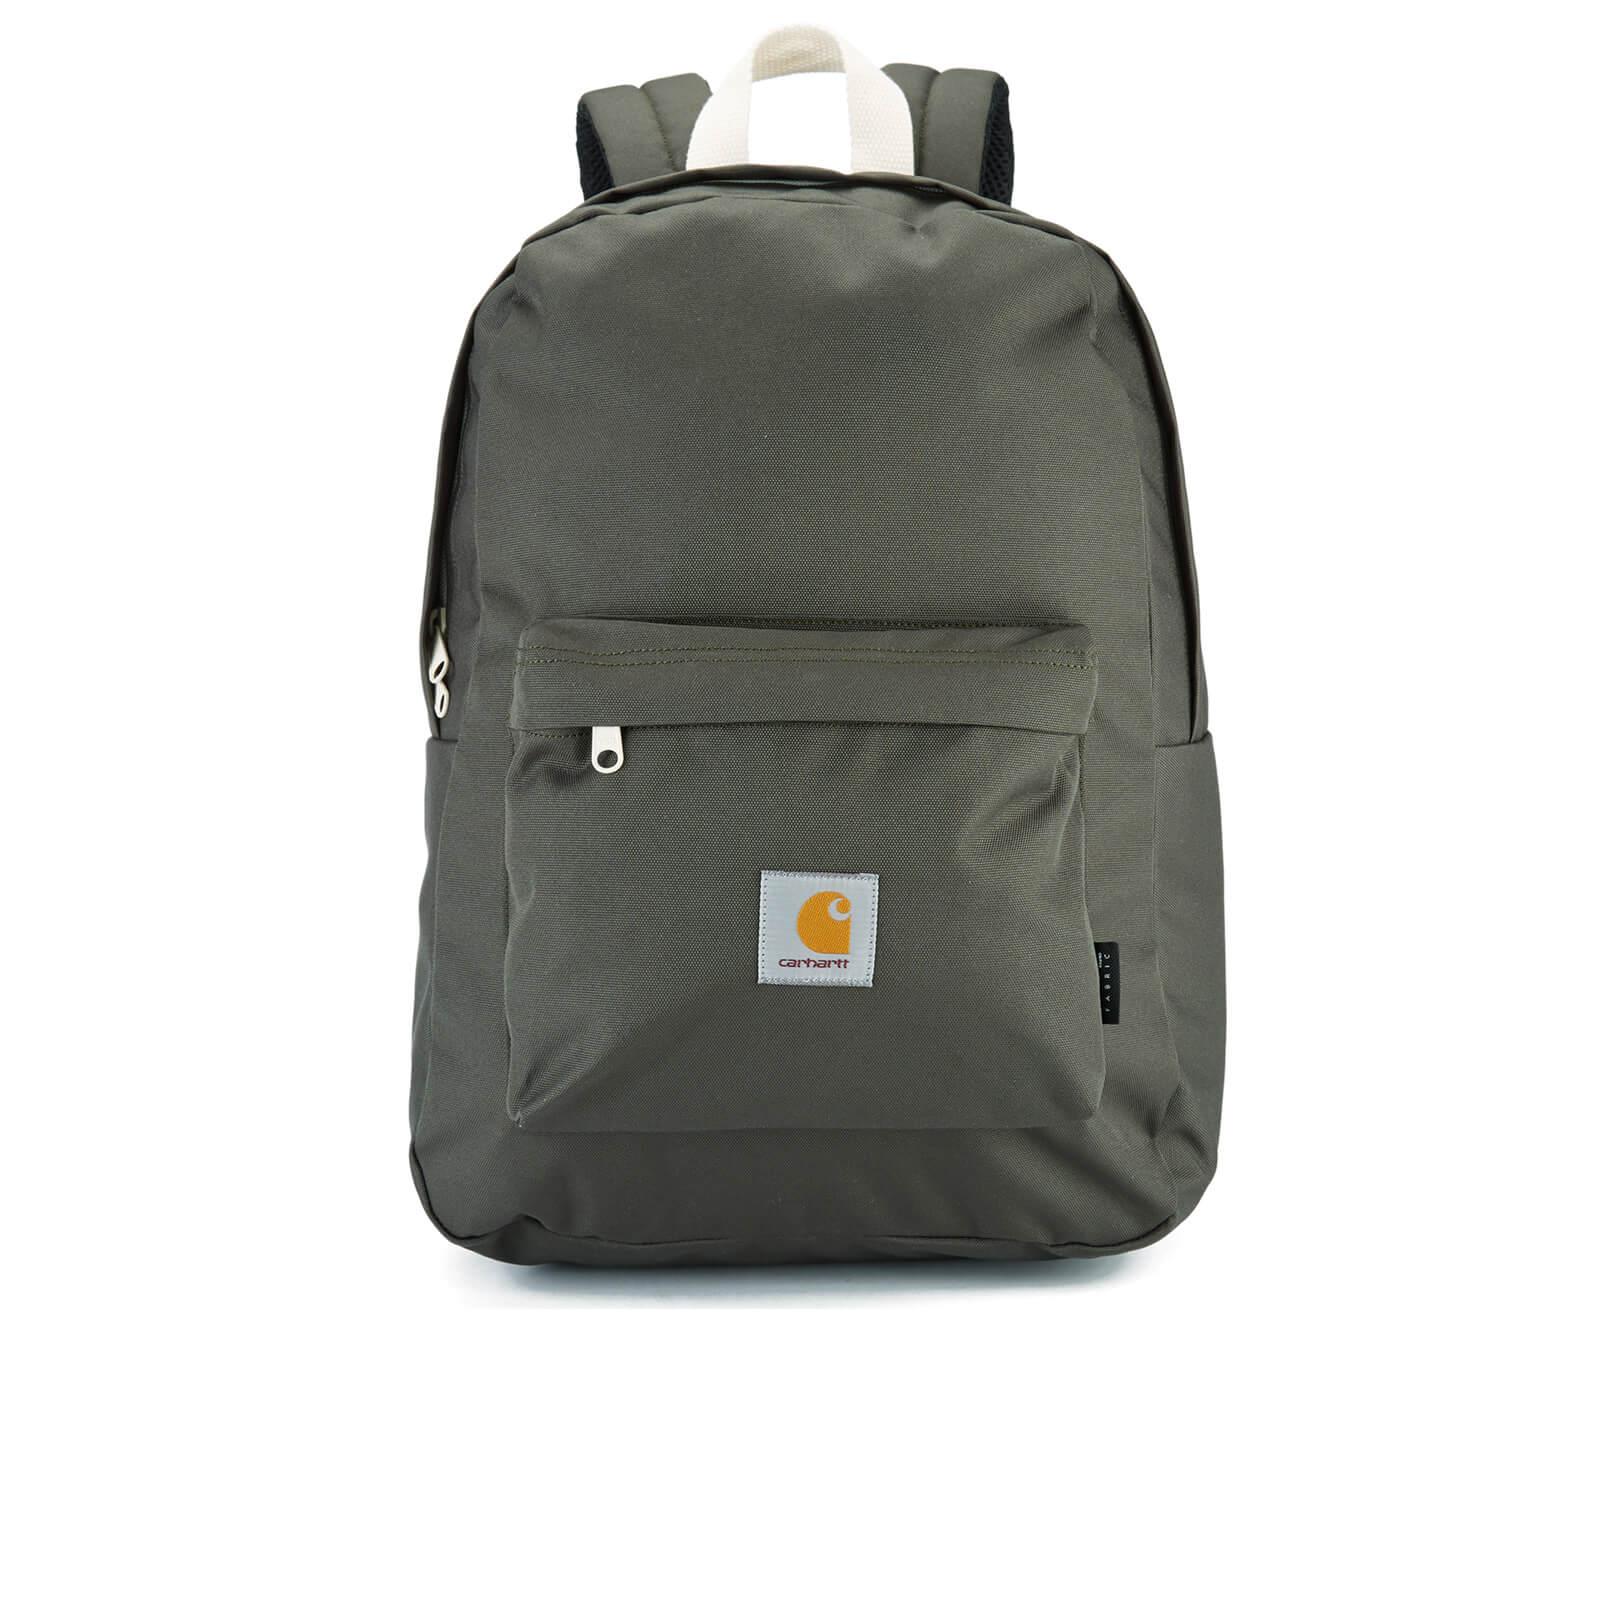 4099caf4db Carhartt Men s Watch Backpack - Cypress Carhartt Men s Watch Backpack -  Cypress